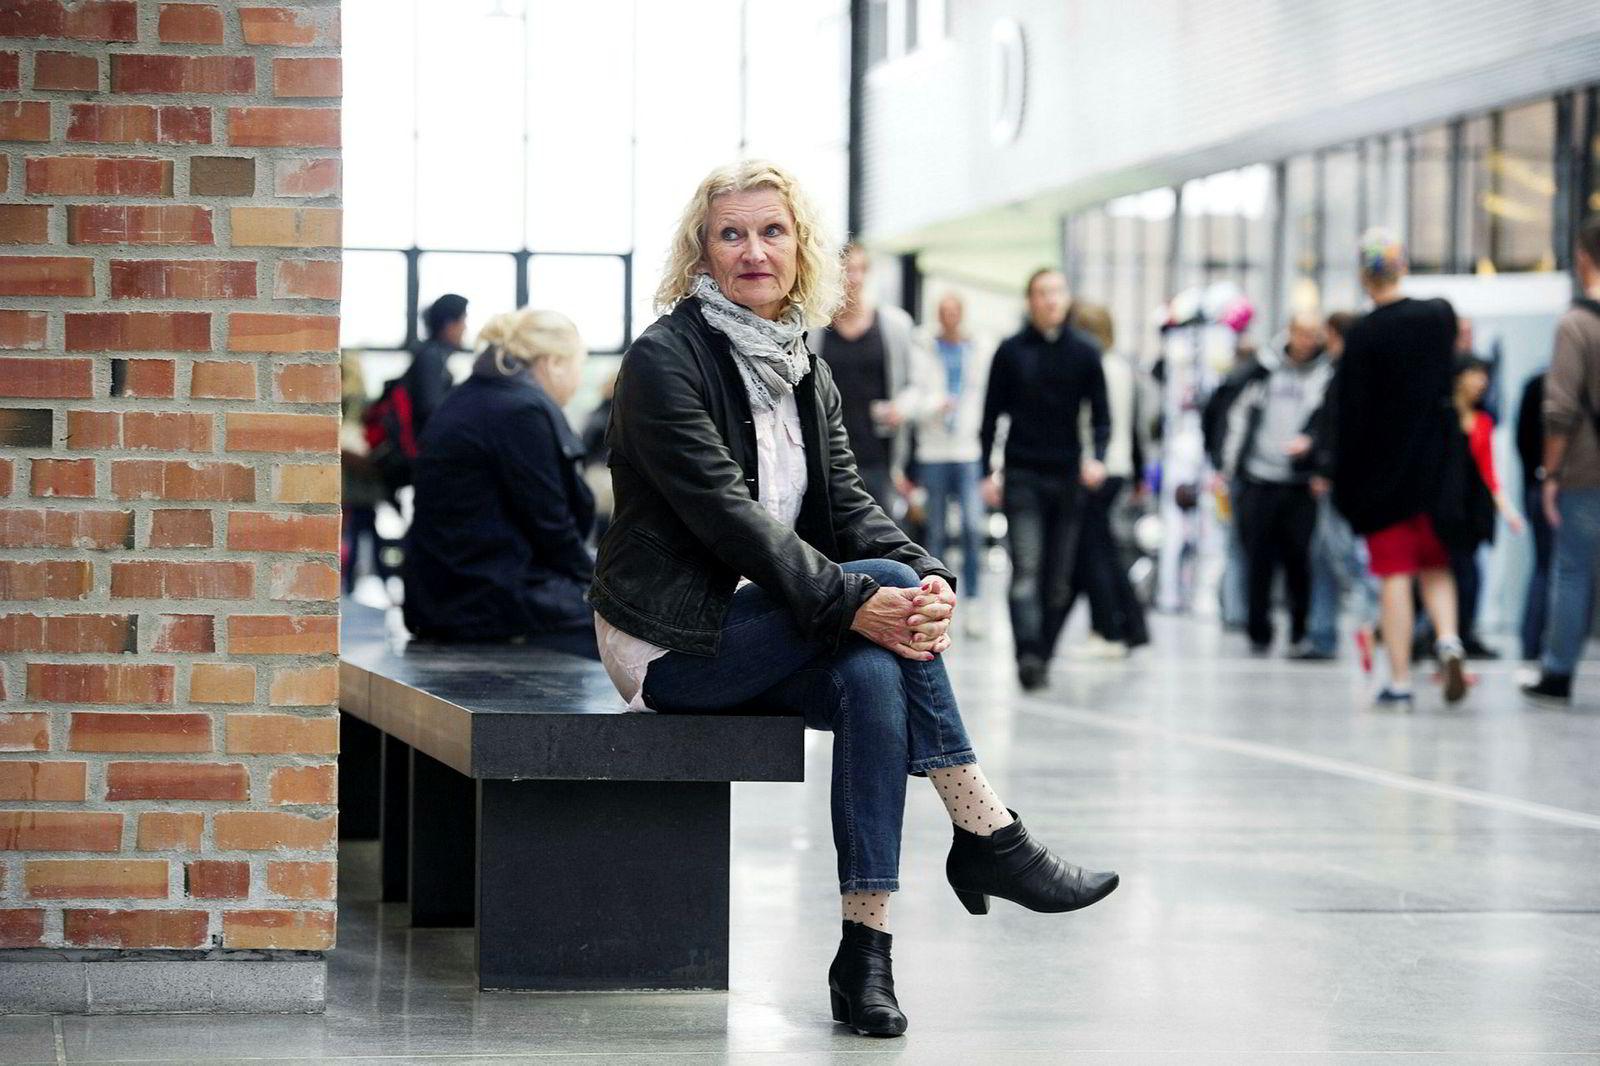 Mannlig seksualitet er irrelevant i Metoo-debatten, ifølge professor Ulla-Britt Lilleaas.